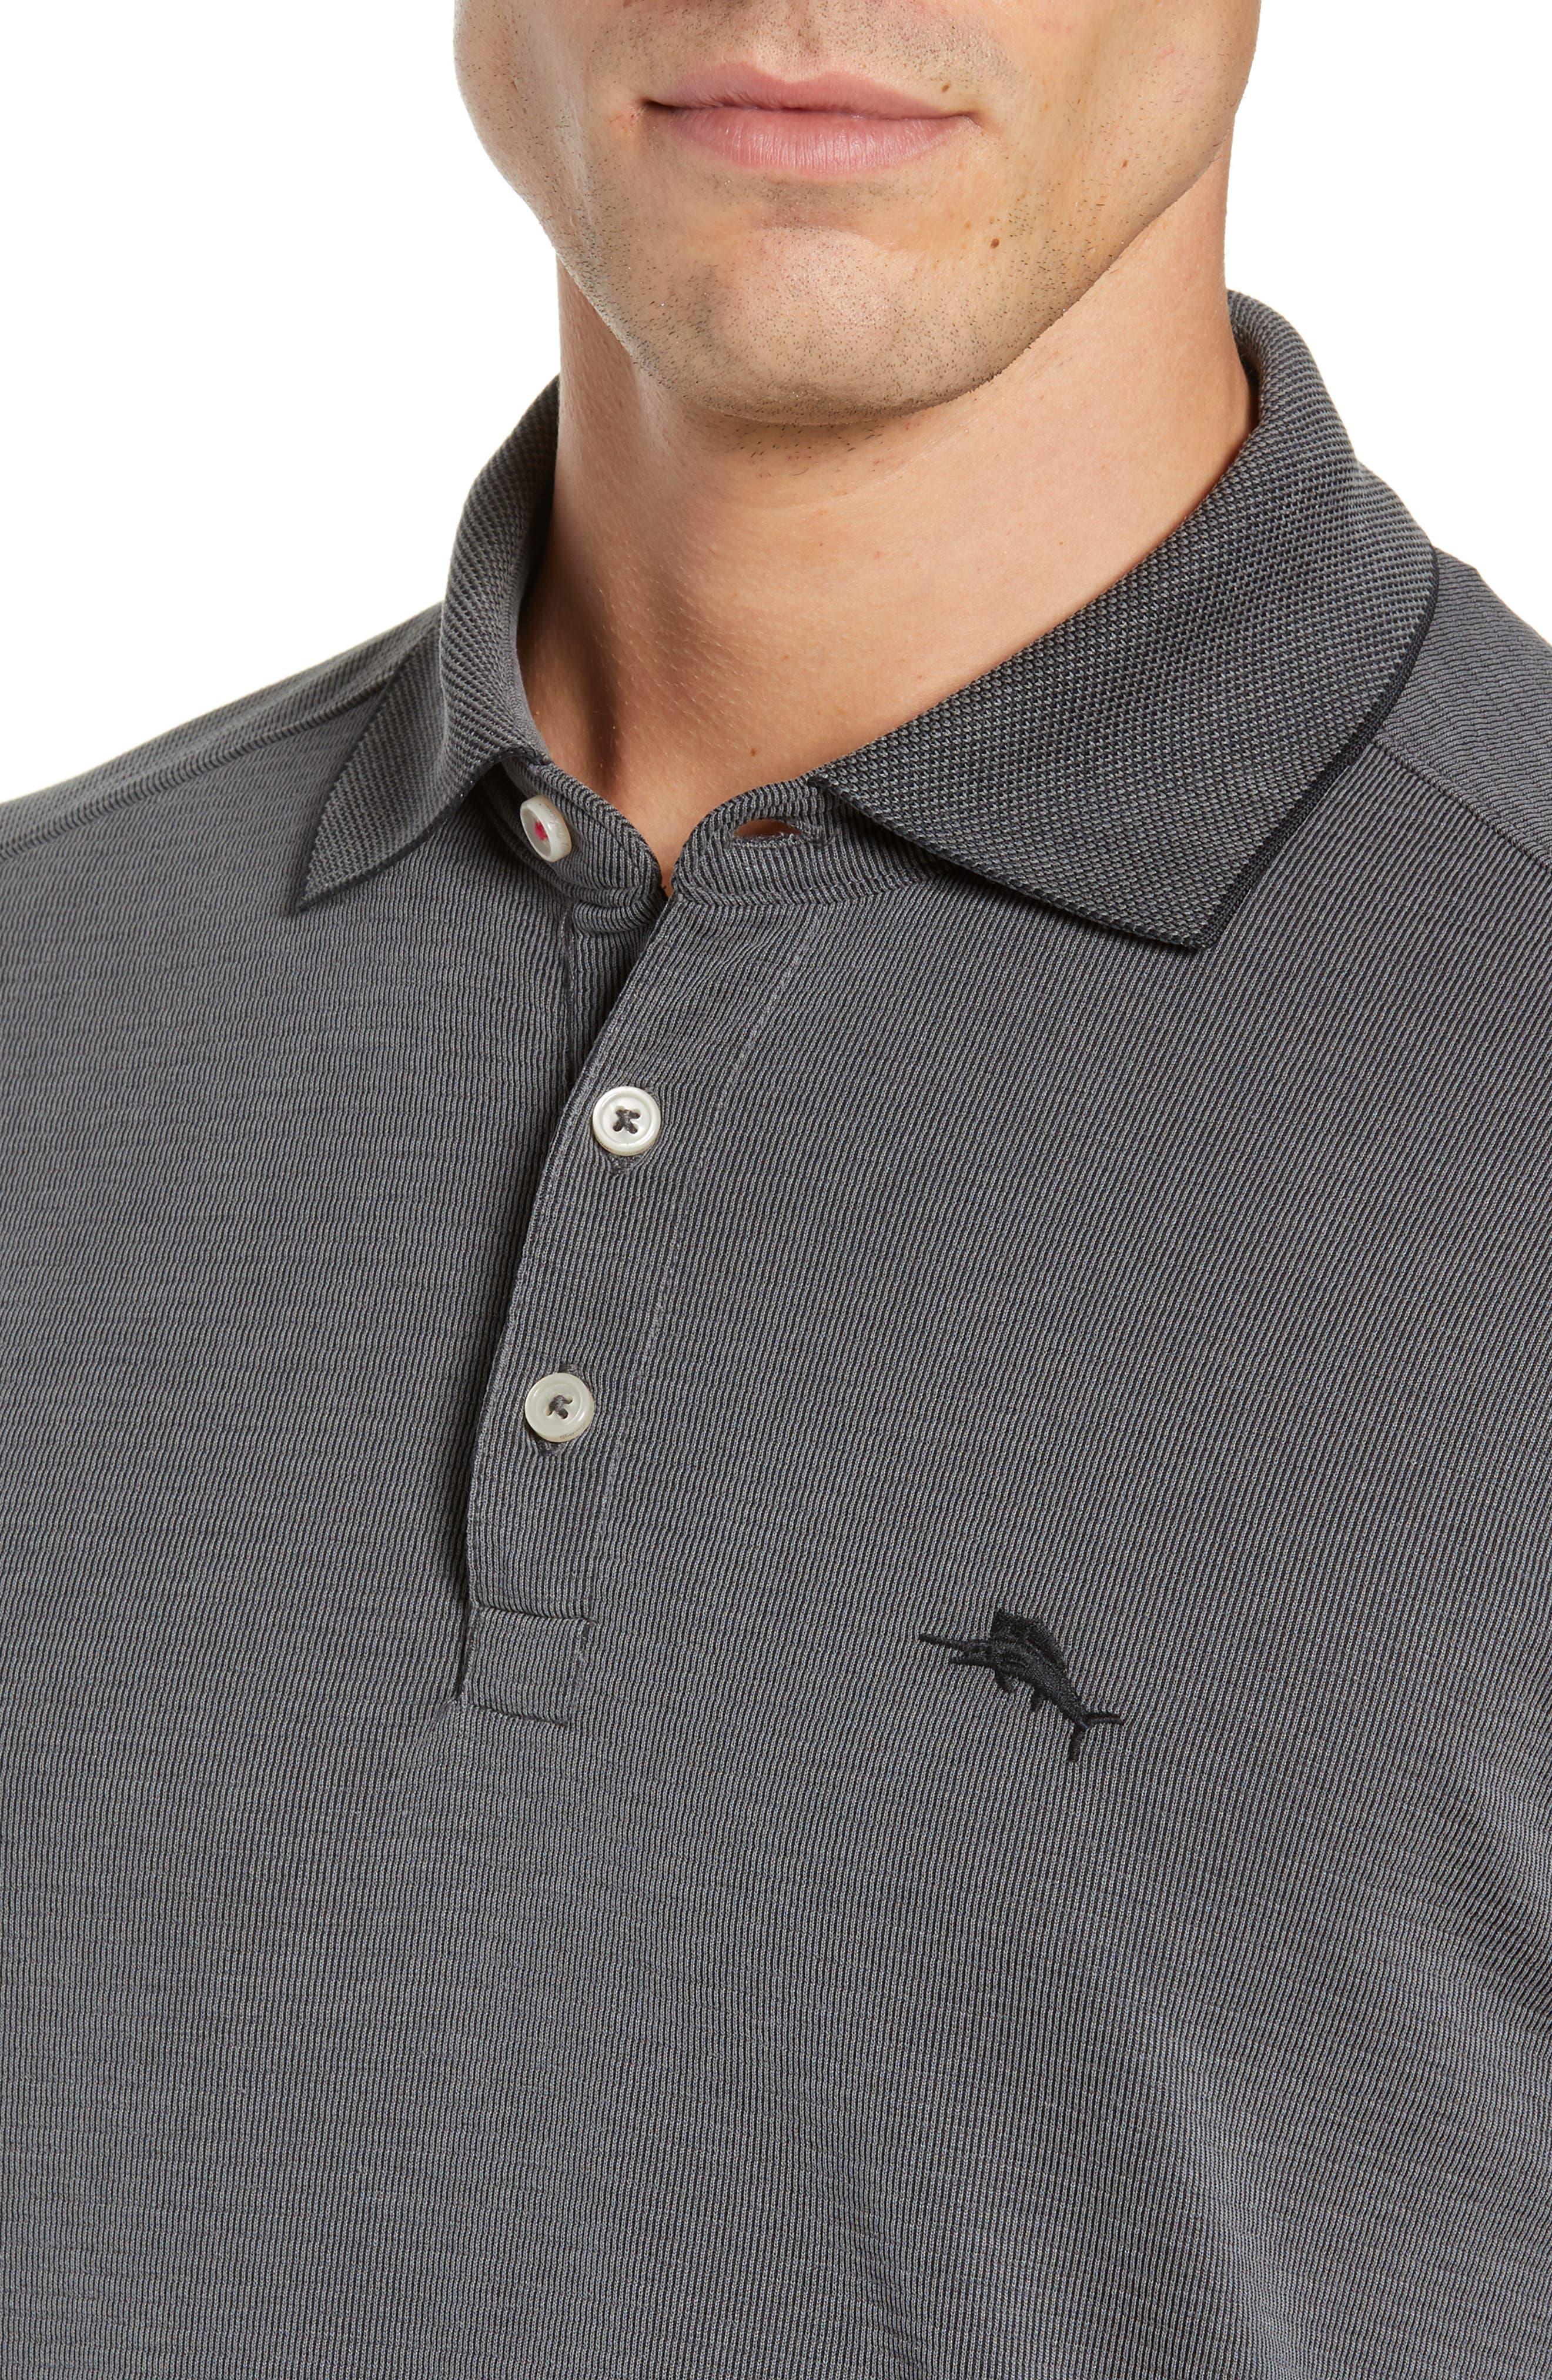 TOMMY BAHAMA, Coastal Crest Regular Fit Polo, Alternate thumbnail 4, color, BLACK